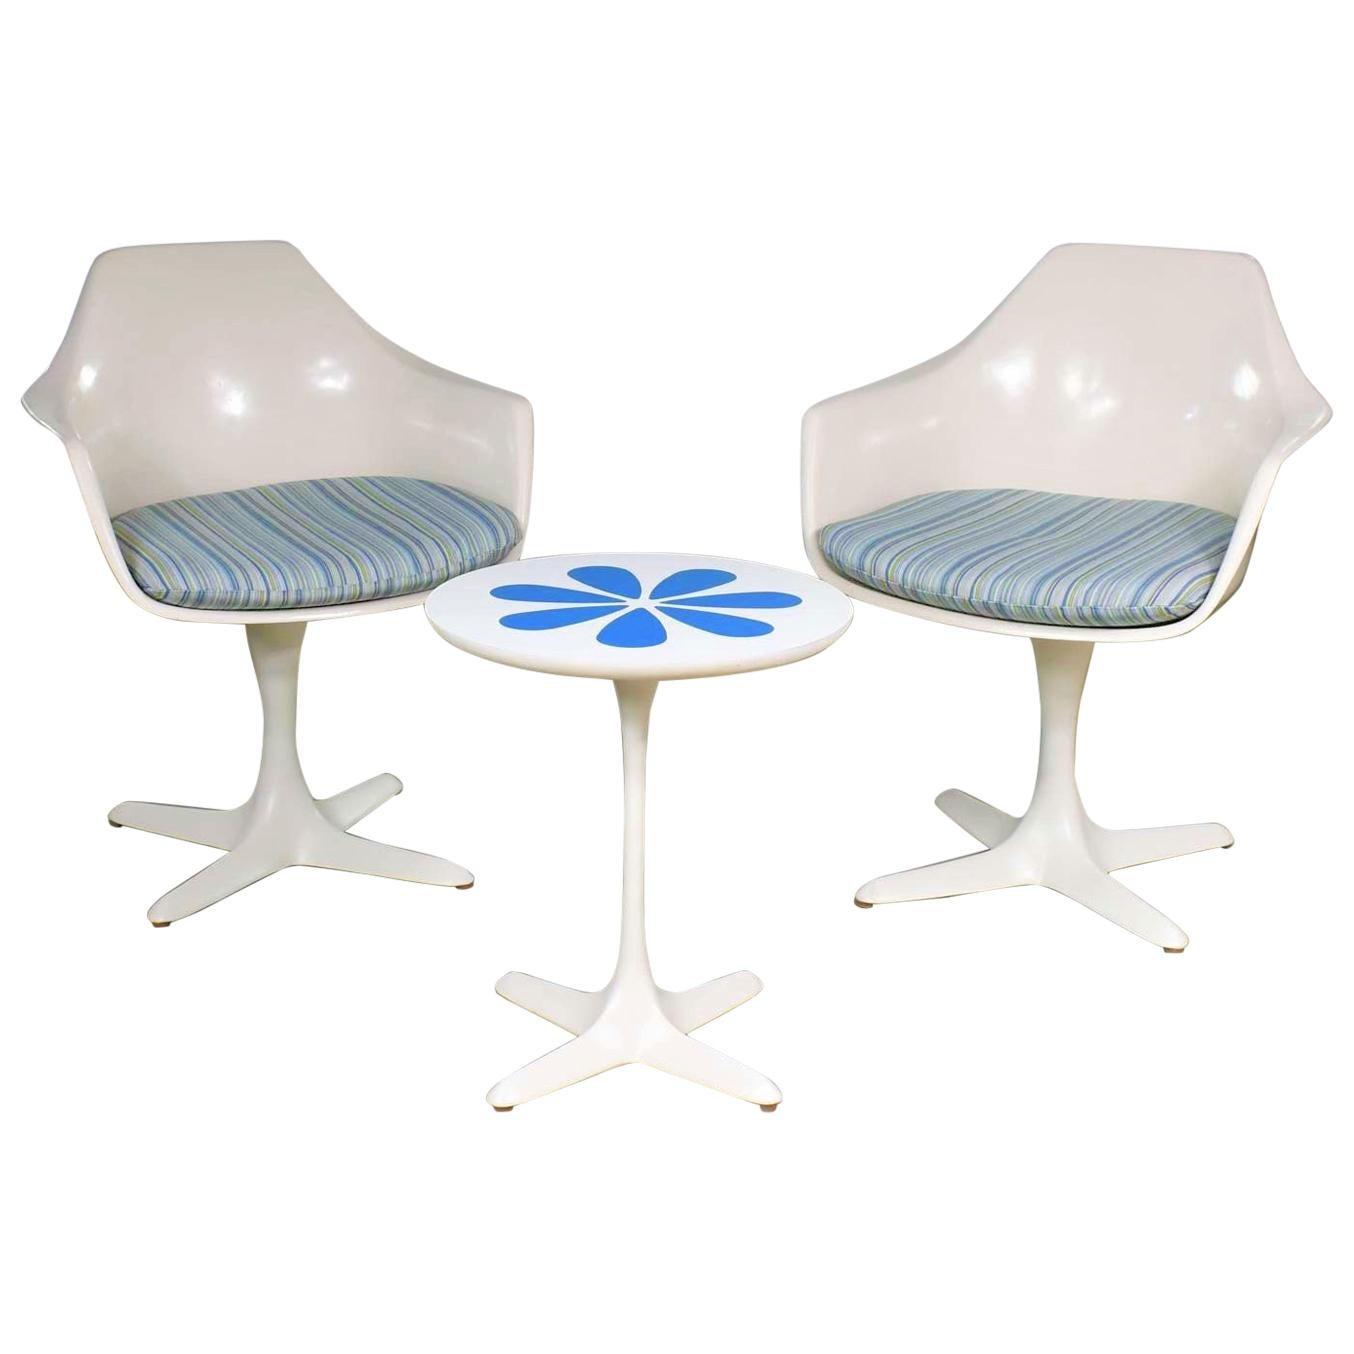 Burke Tulip Style Swivel Chairs & Side Table Mod Flower Petal Design Blue White